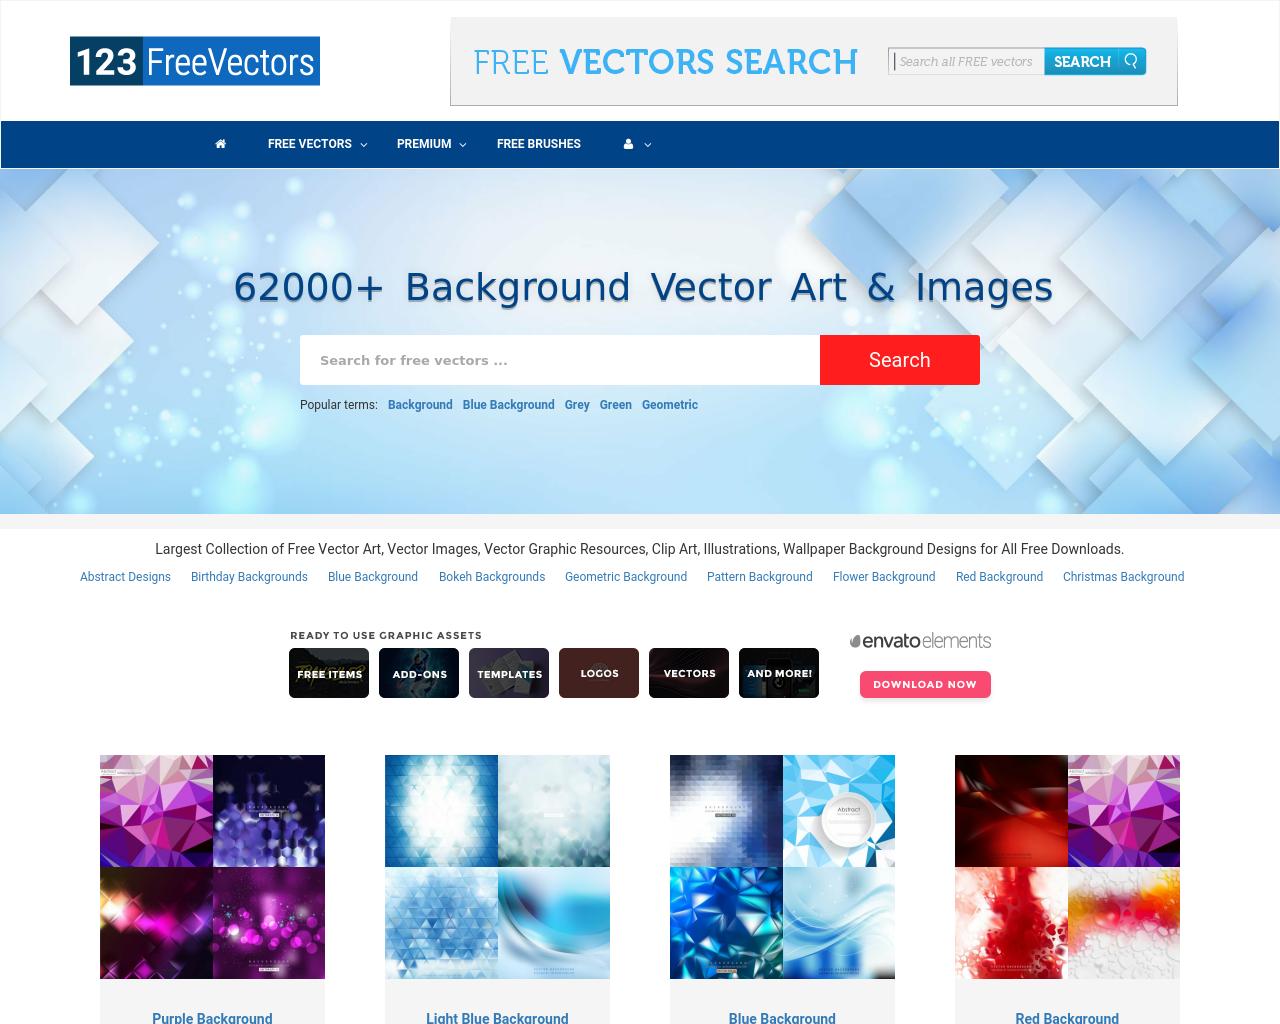 123-Free-Vectors-Advertising-Reviews-Pricing